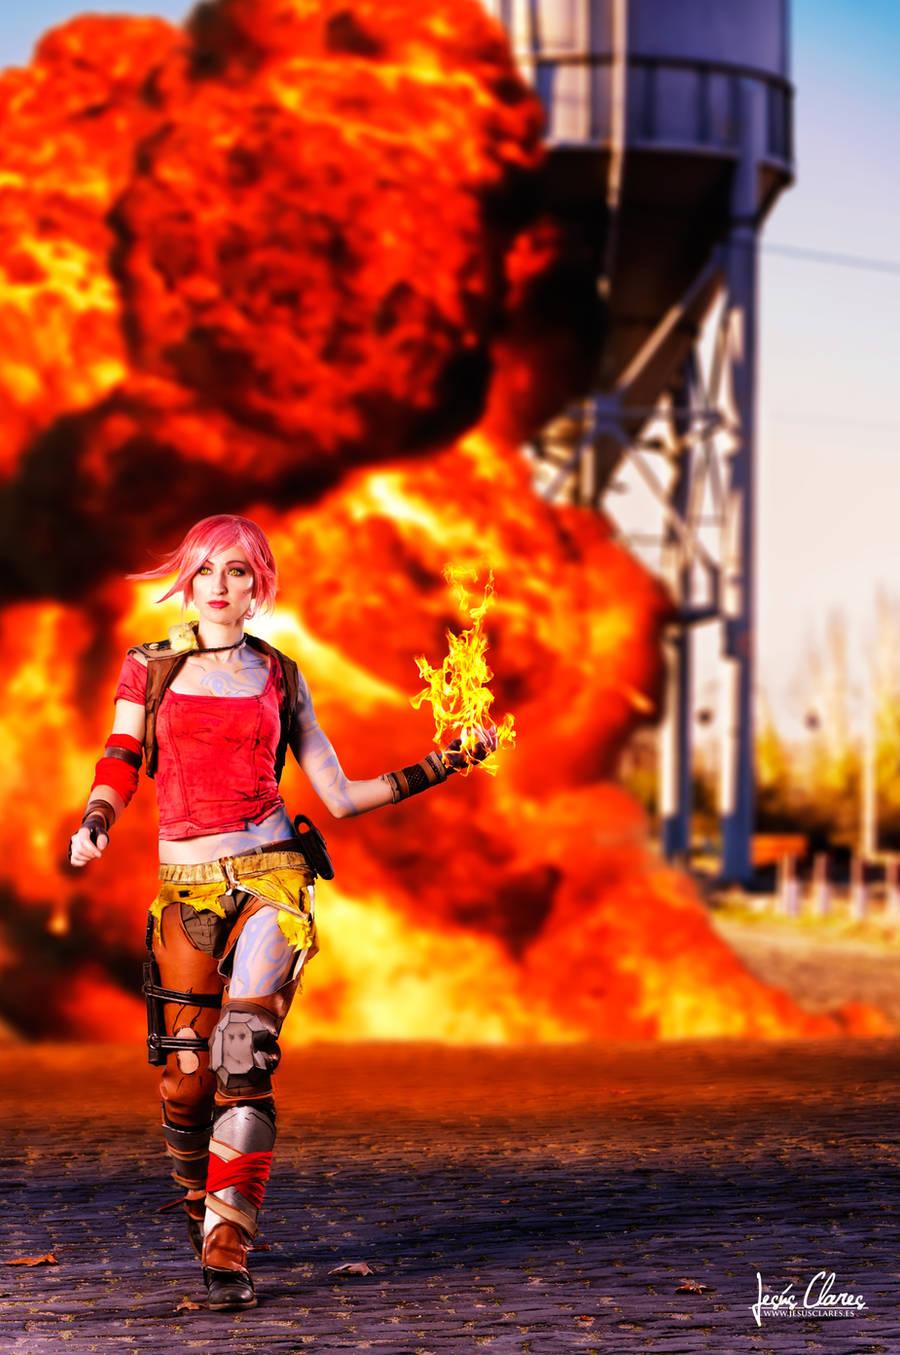 Lilith the Firehawk by Nebulaluben